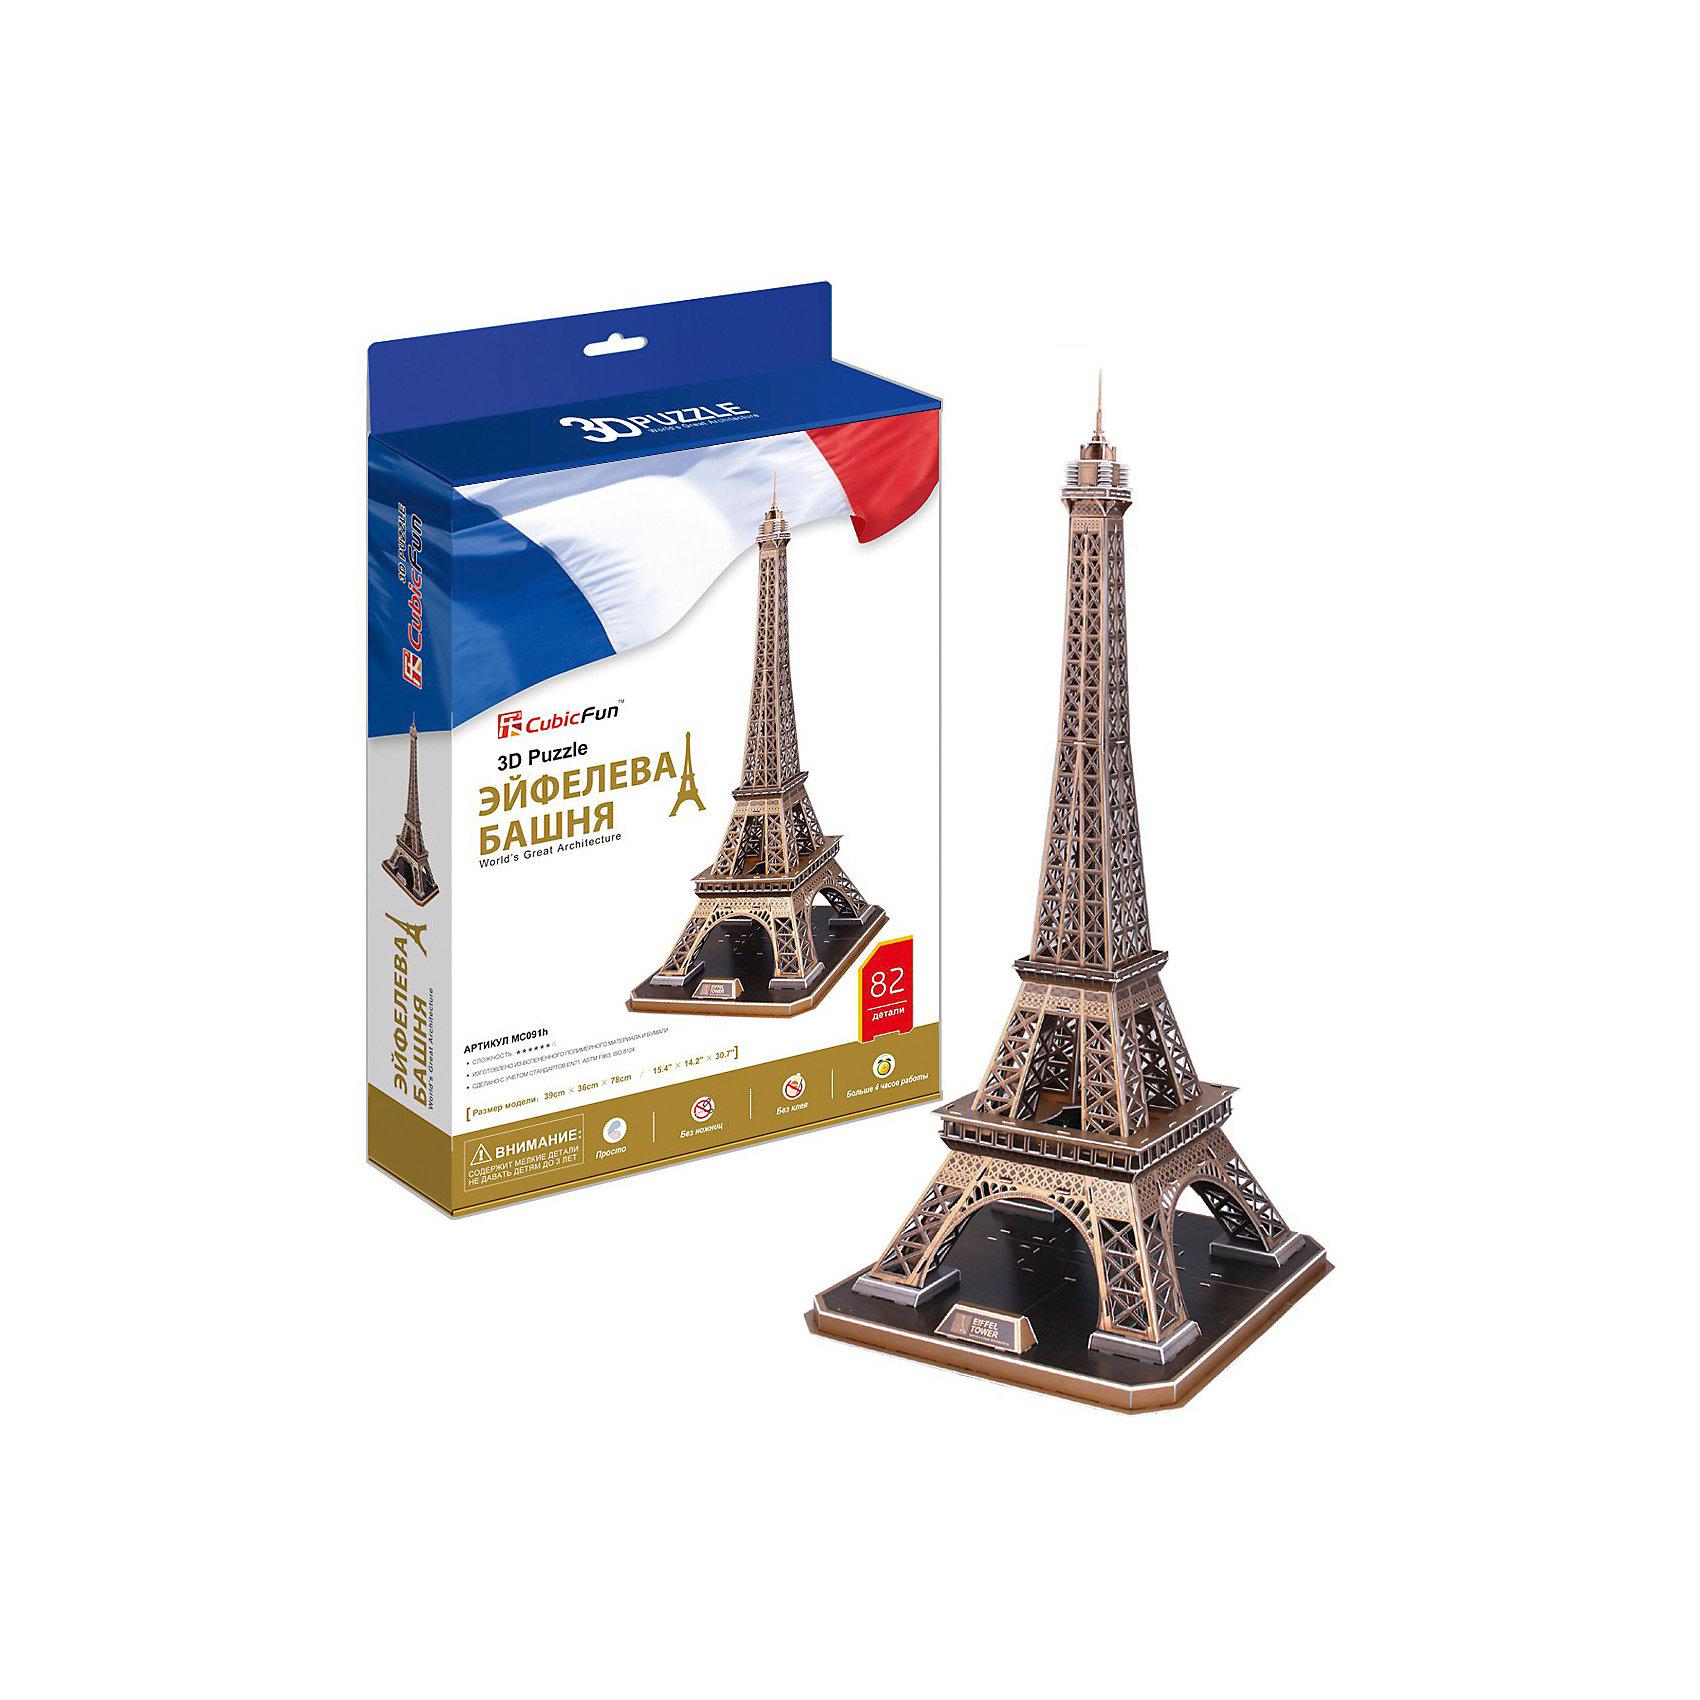 CubicFun Пазл 3D Эйфелева Башня (Франция), 82 детали, CubicFun cubicfun 3d пазл эйфелева башня 2 франция cubicfun 33 детали